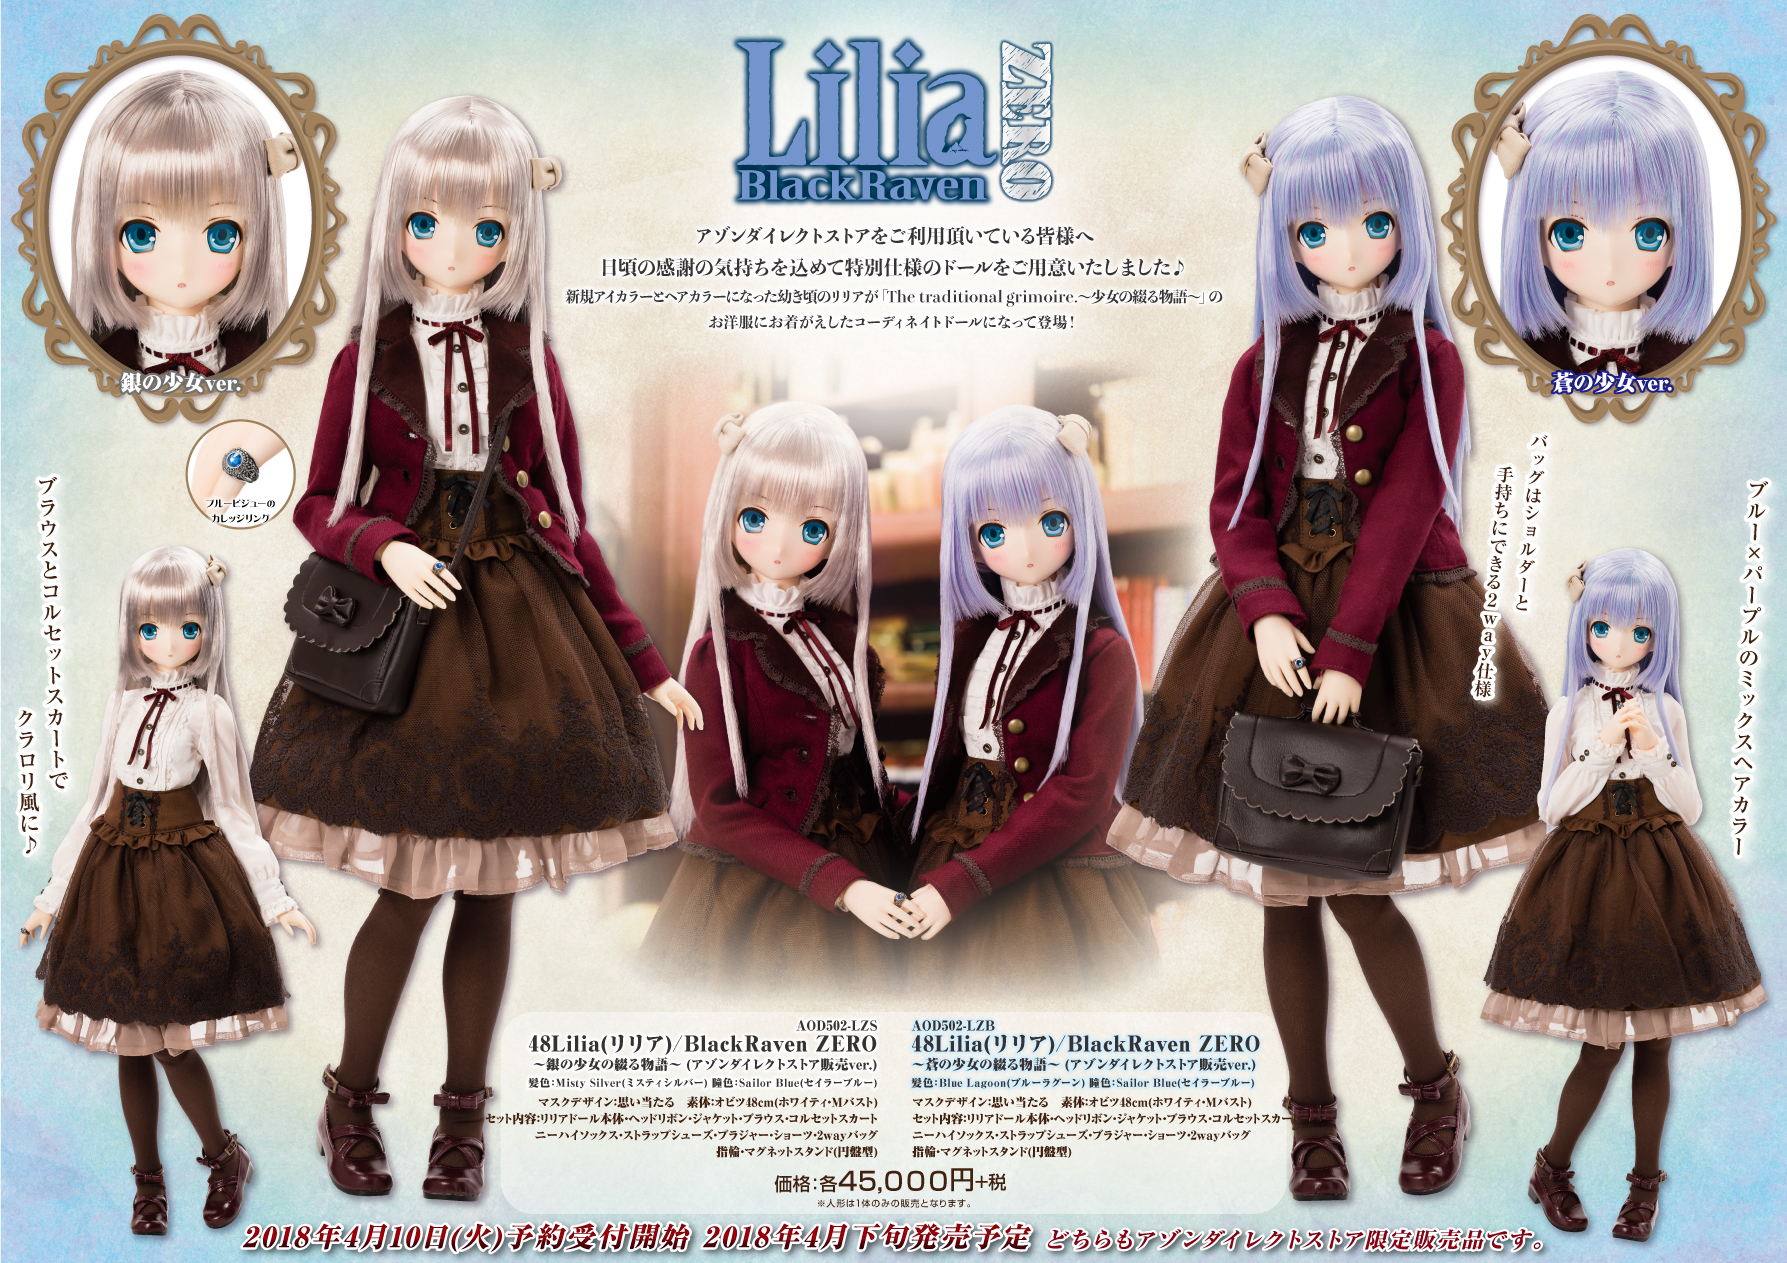 48Lilia(リリア)/BlackRaven ZERO ~銀の少女の綴る物語~(アゾンダイレクトストア販売ver.)